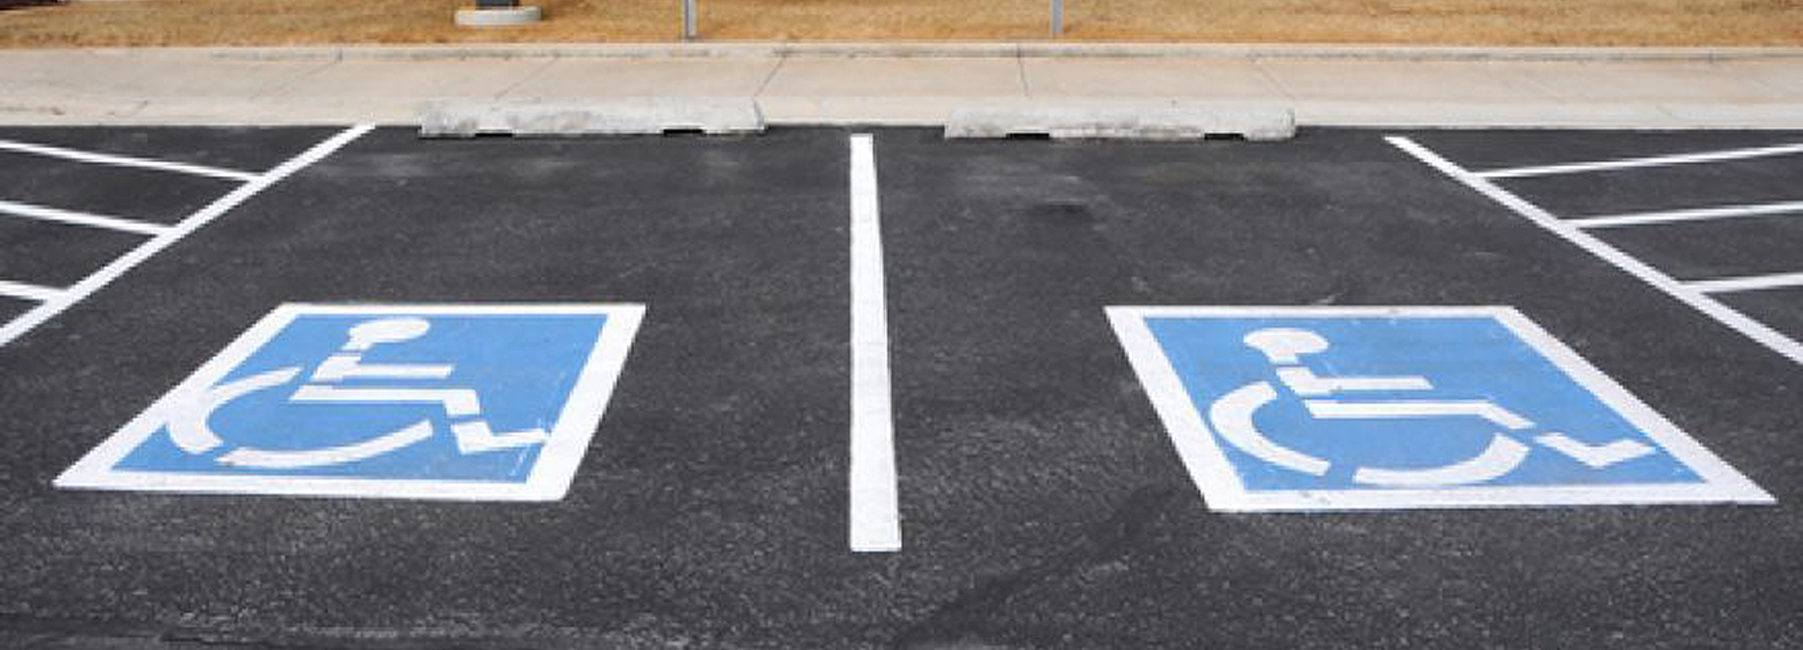 Kultura parkiranja